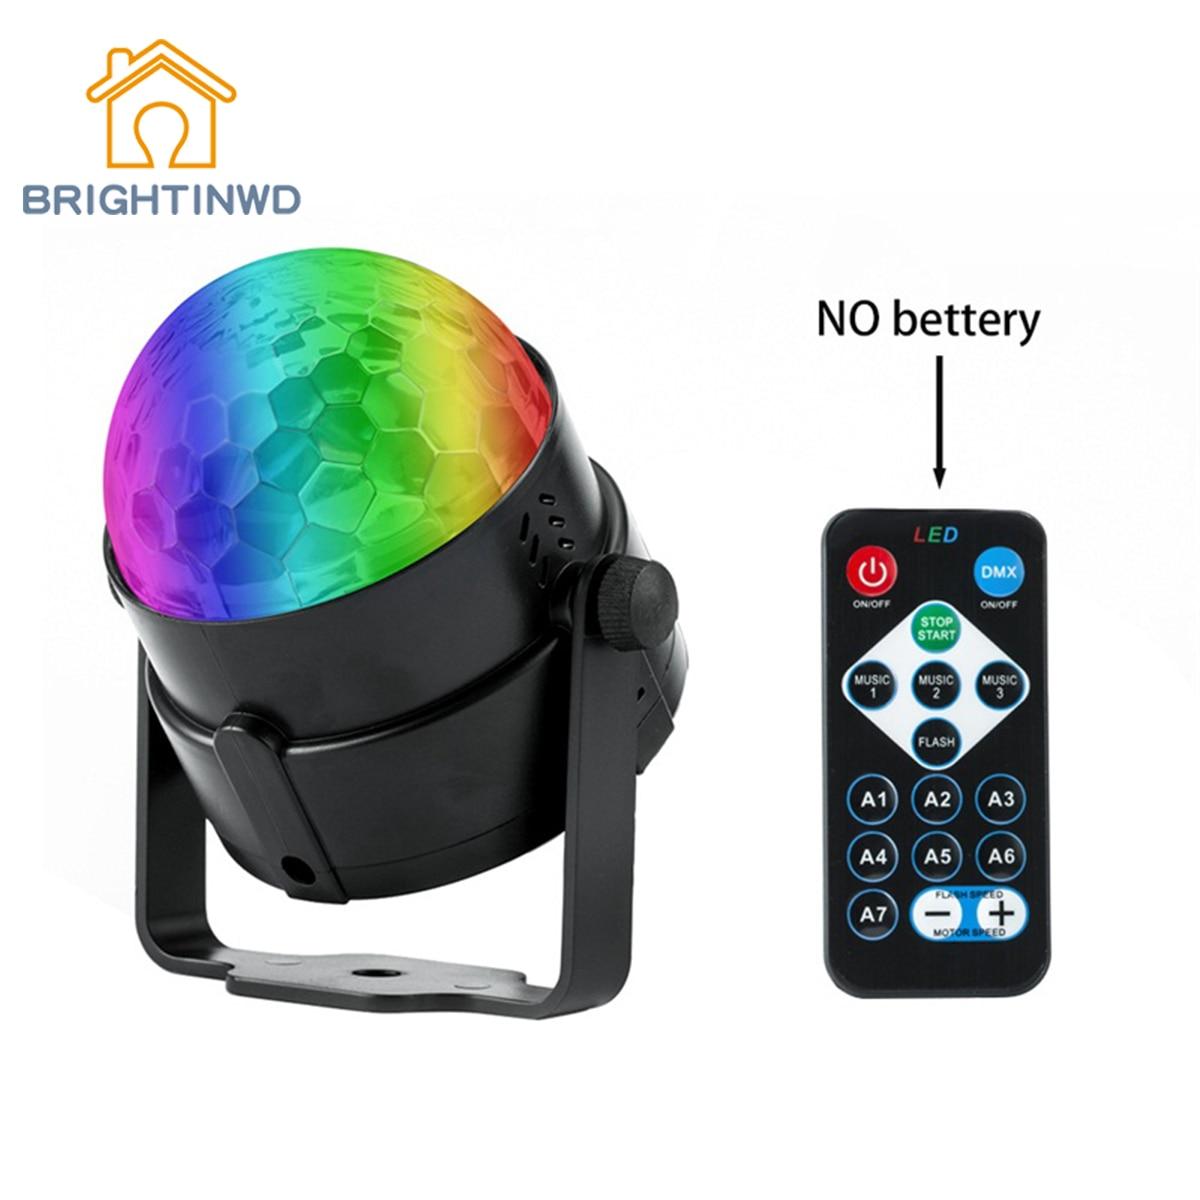 BRIGHTINWD DJ Club Effect Light RGB LED Crystal Disco Ball Strobe Party Lights With Remote Control Rotating Stage Lights Dj